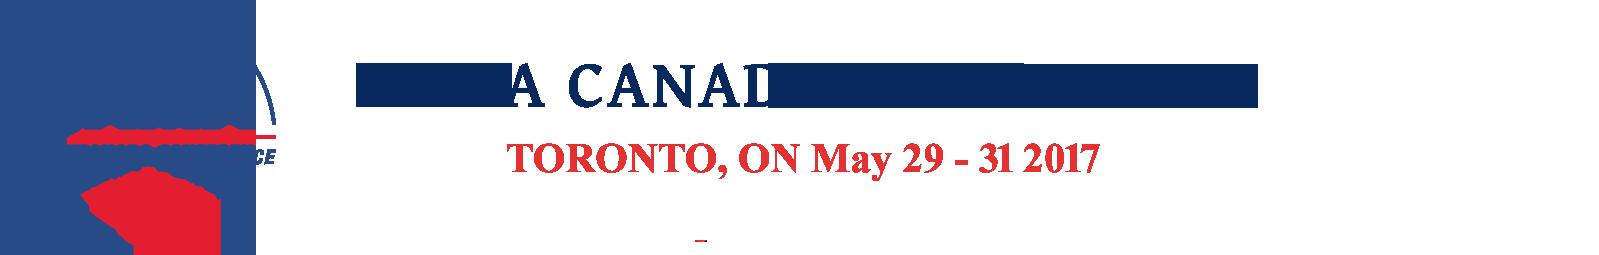 ARMA Canada Conference